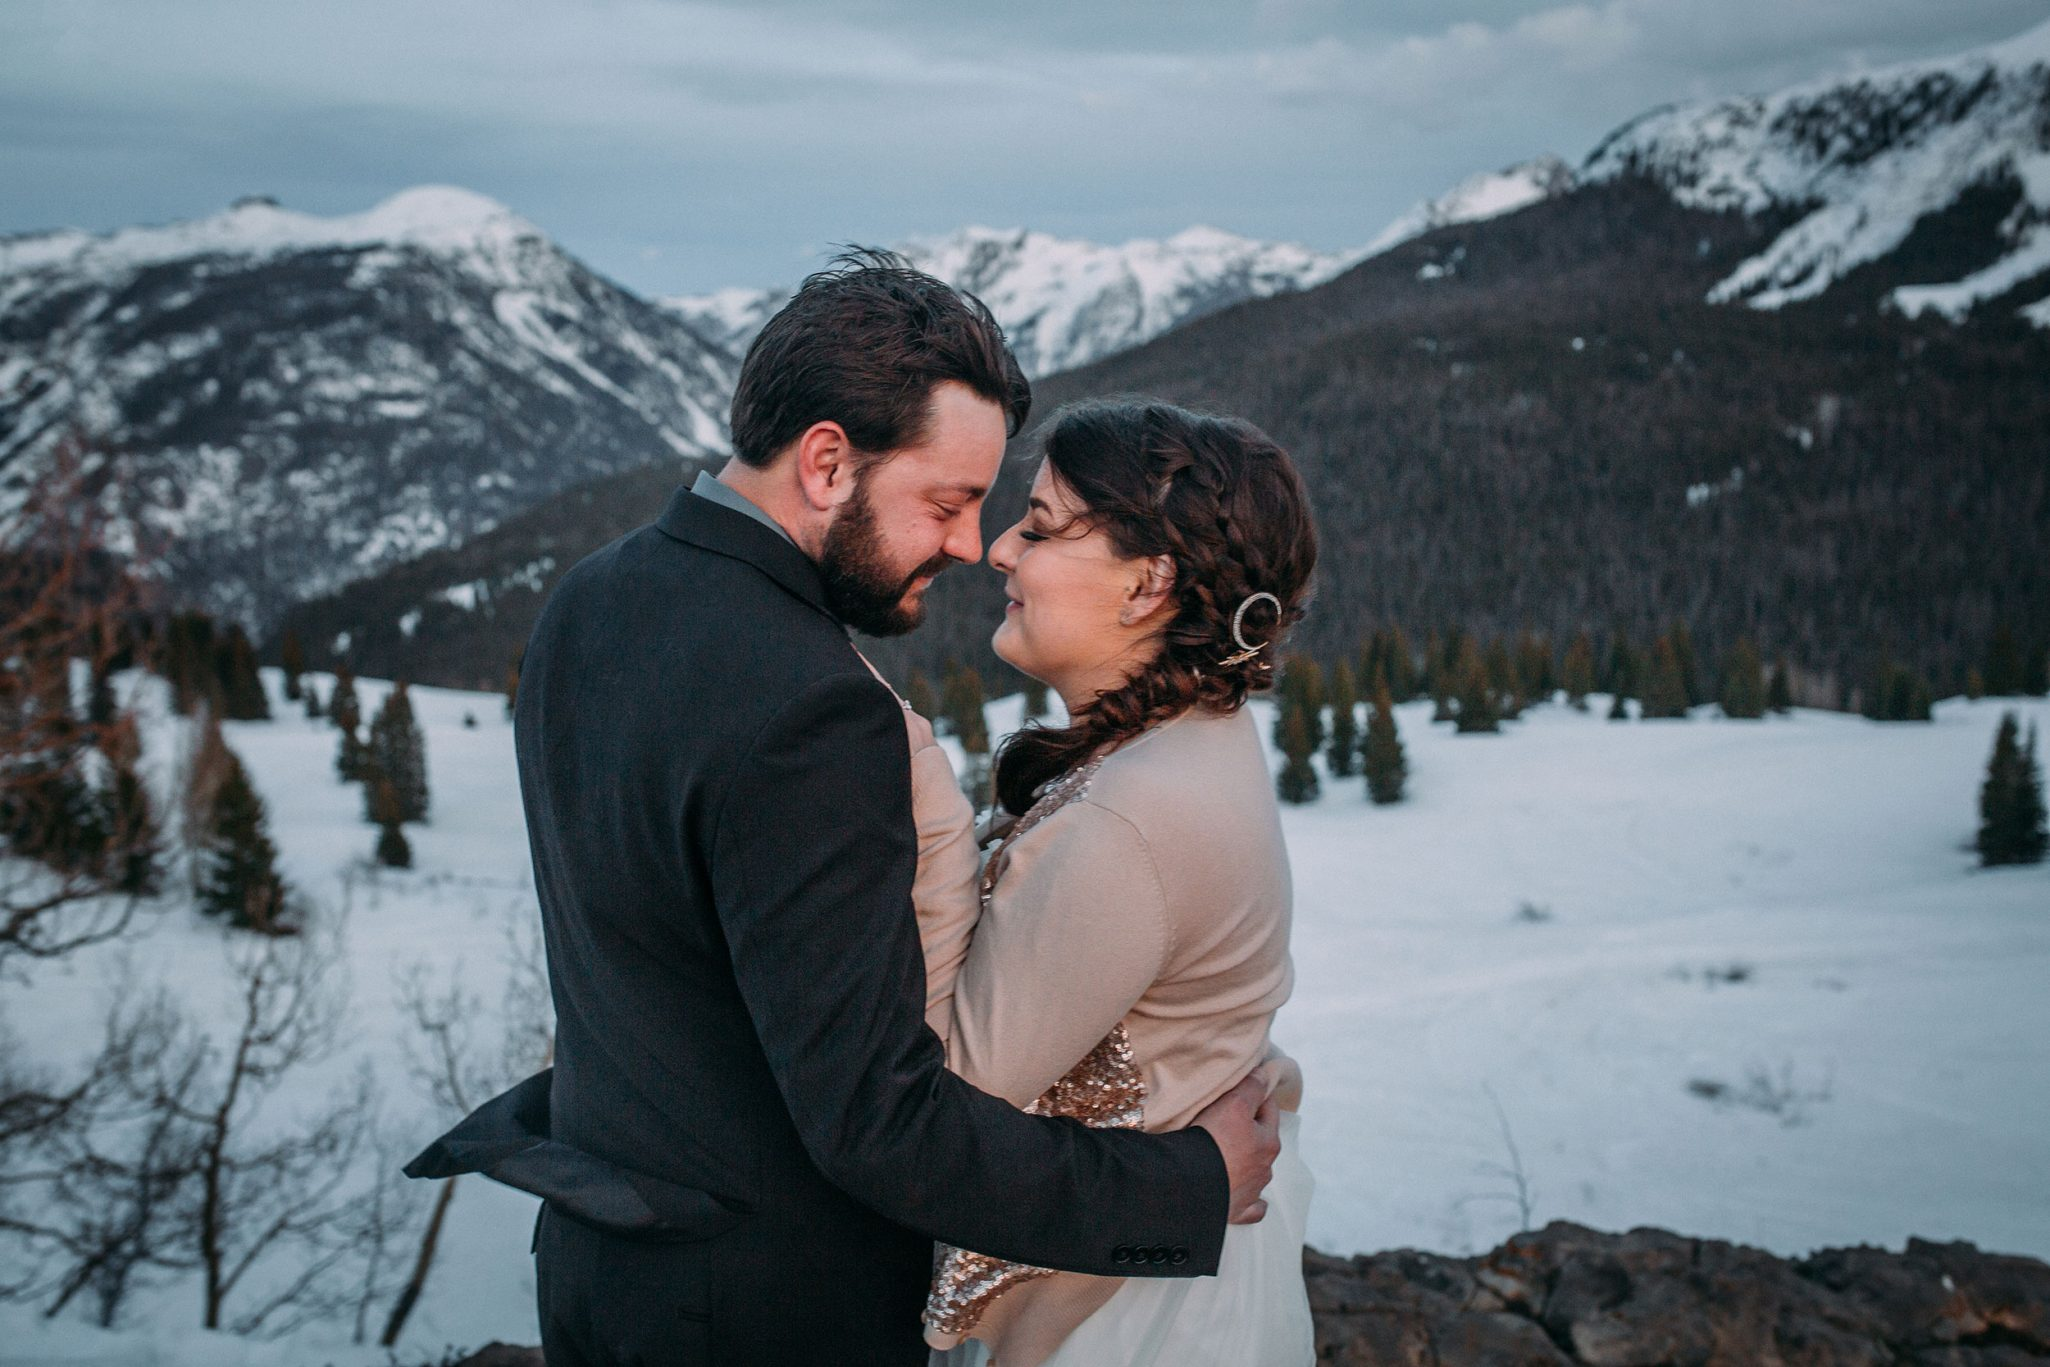 Early Spring wedding in Durango, Colorado